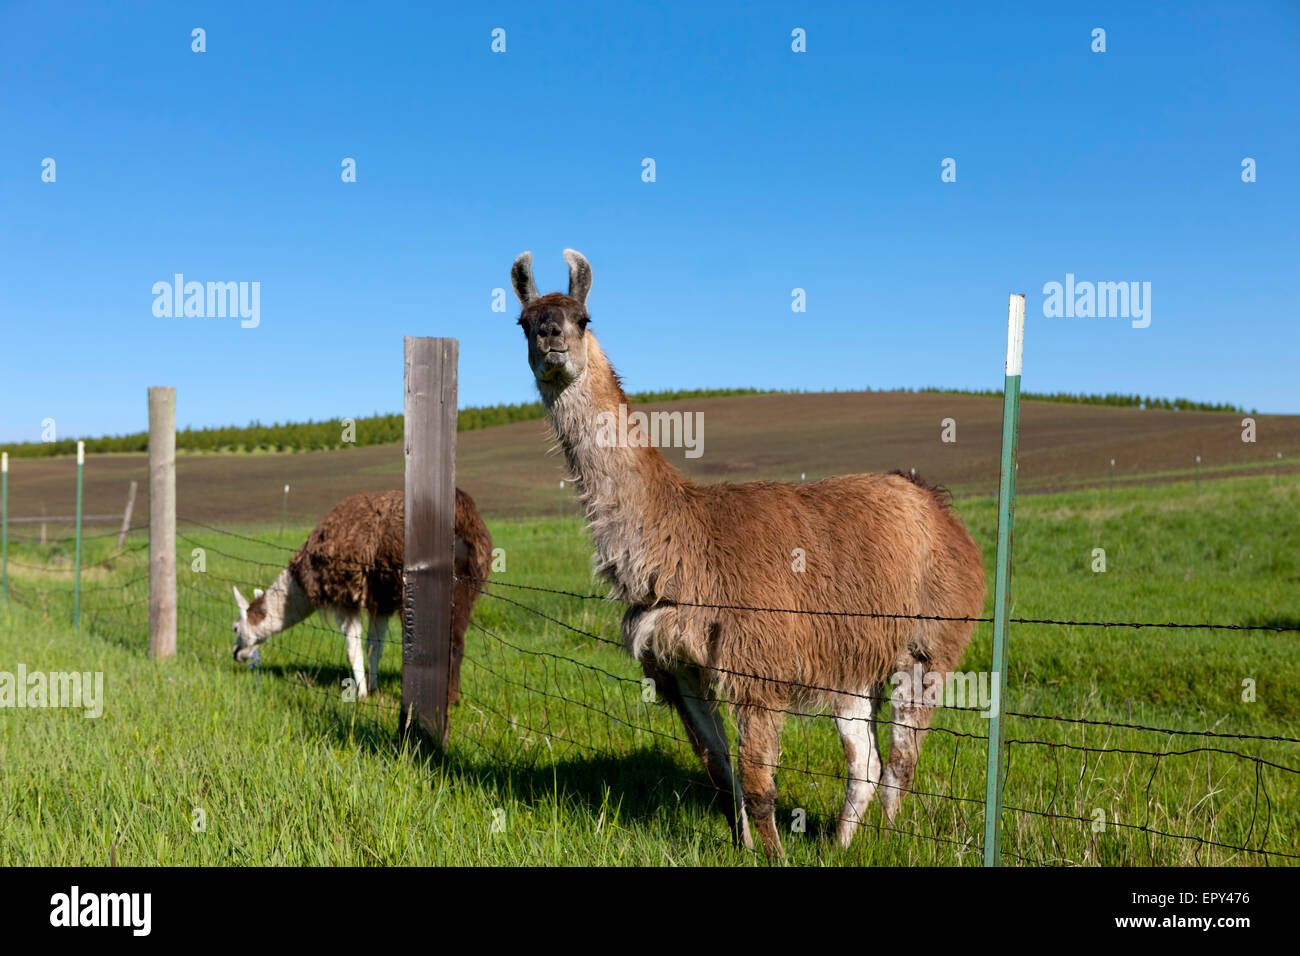 Two Llamas grazing by the fence near Potlach, Idaho. - Stock Image